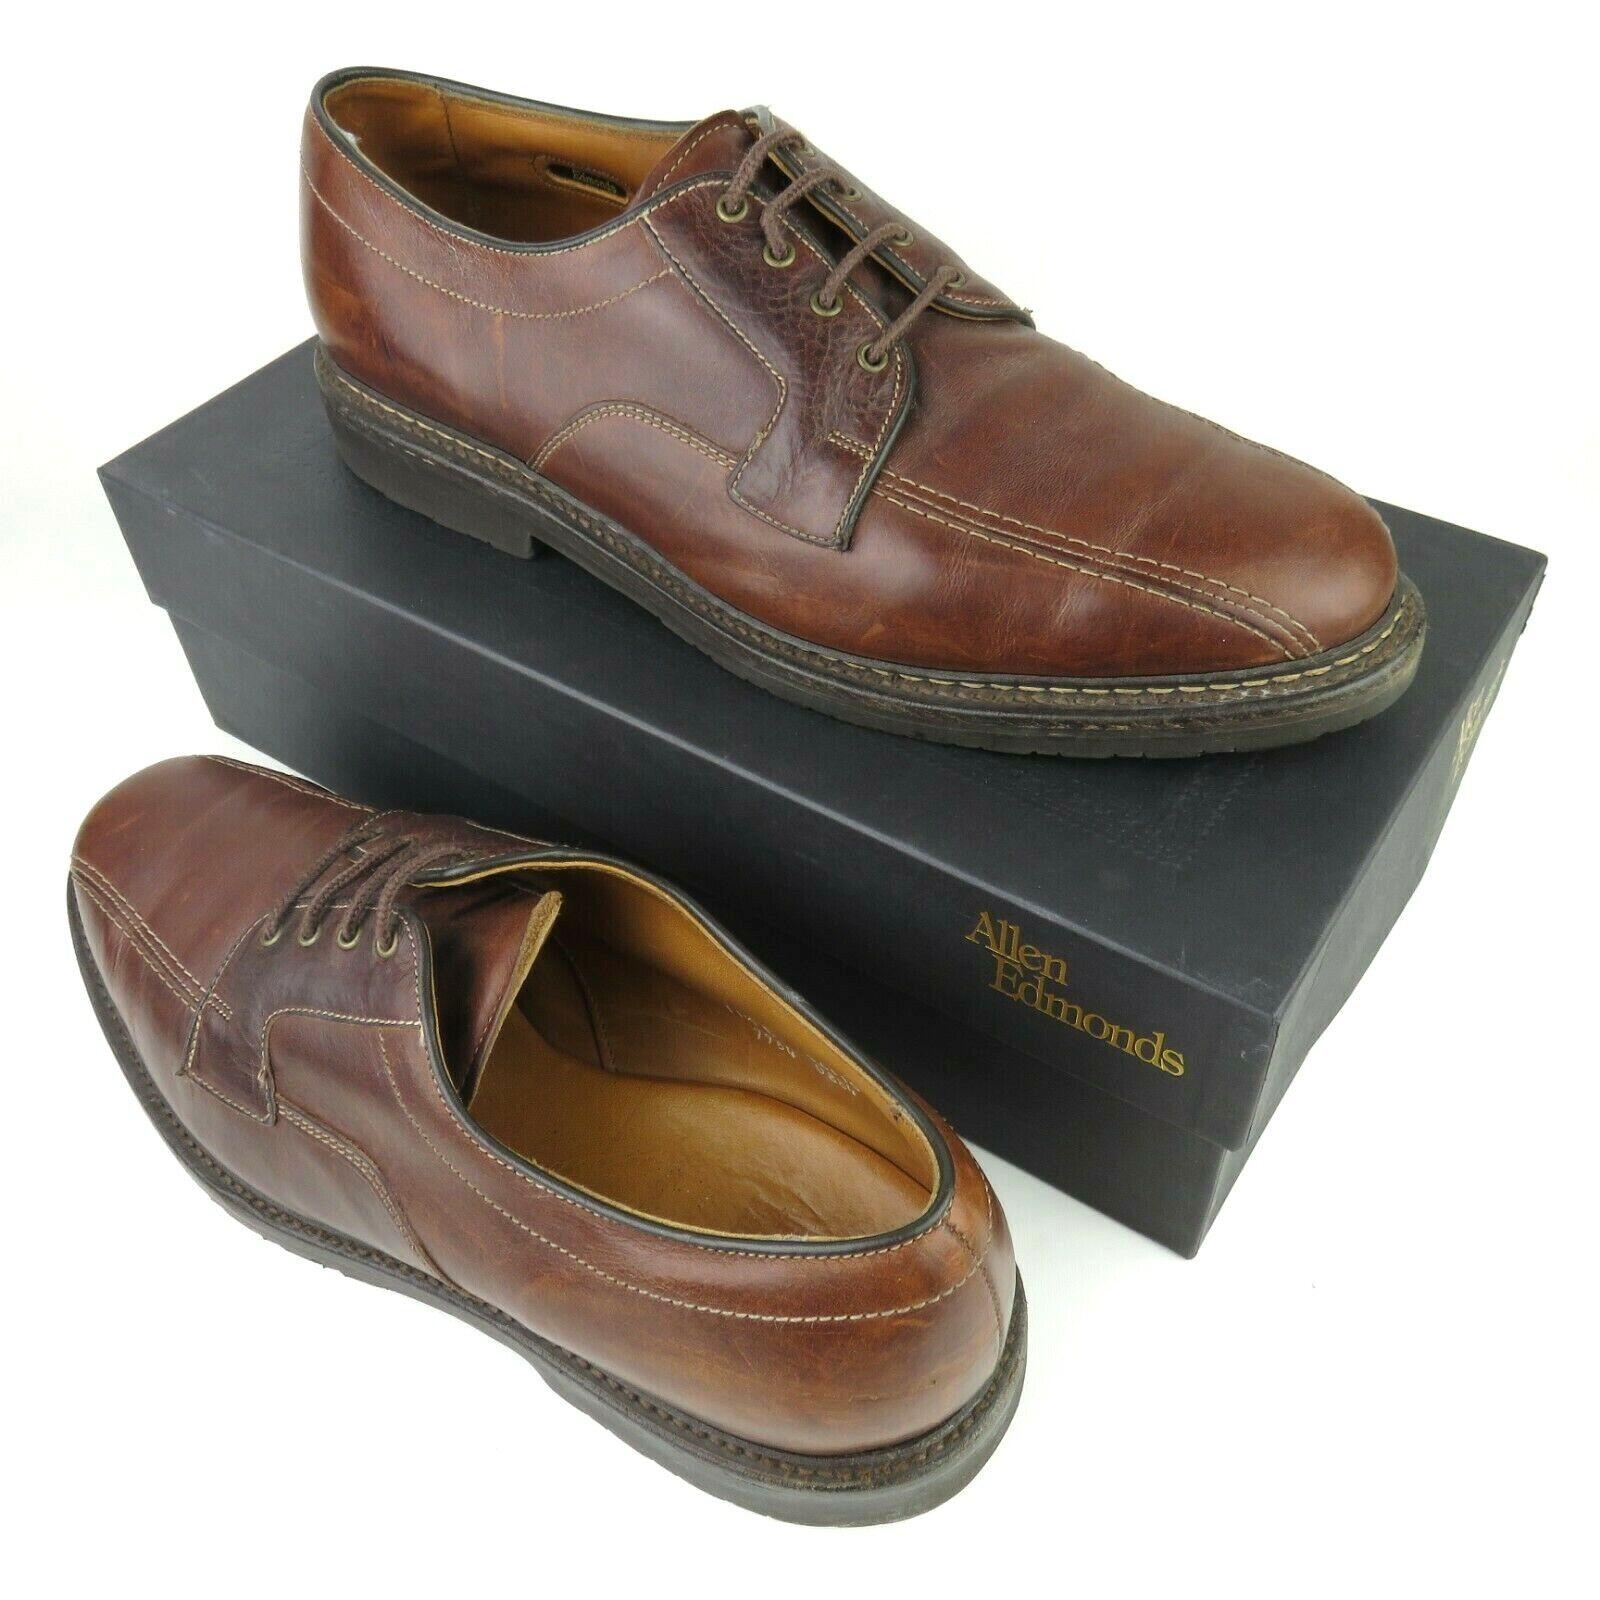 ALLEN EDMONDS  MAPLETON   Marron Vélo Toe Oxford Chaussures   taille 11.5 B